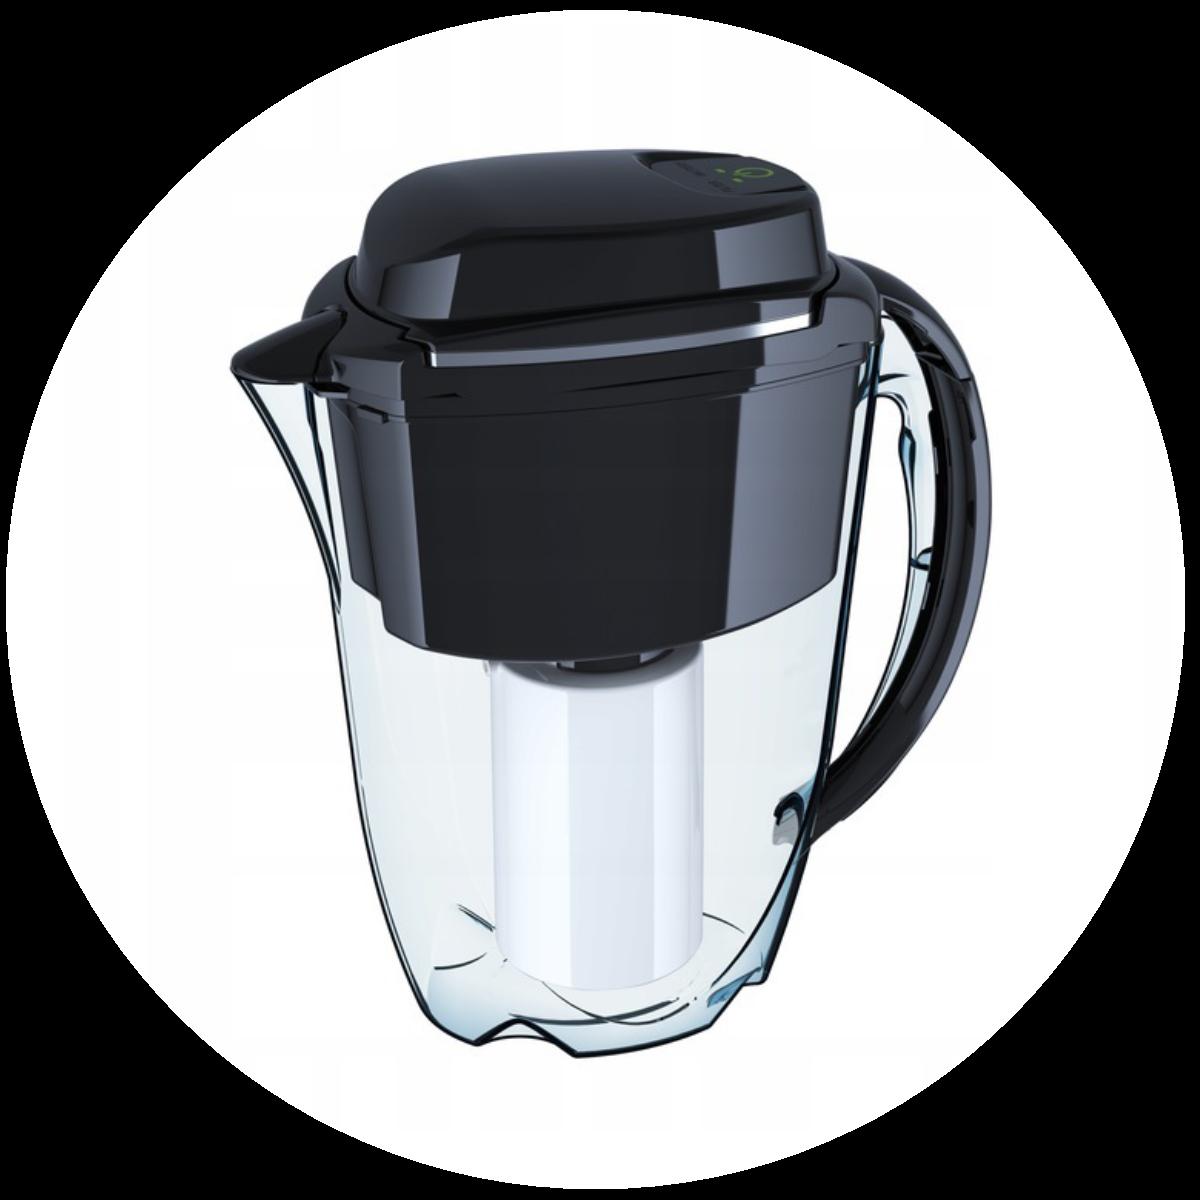 Aquaphor J.Shmidt 500 (czarny) dzbanek filtrujący - zmywarka